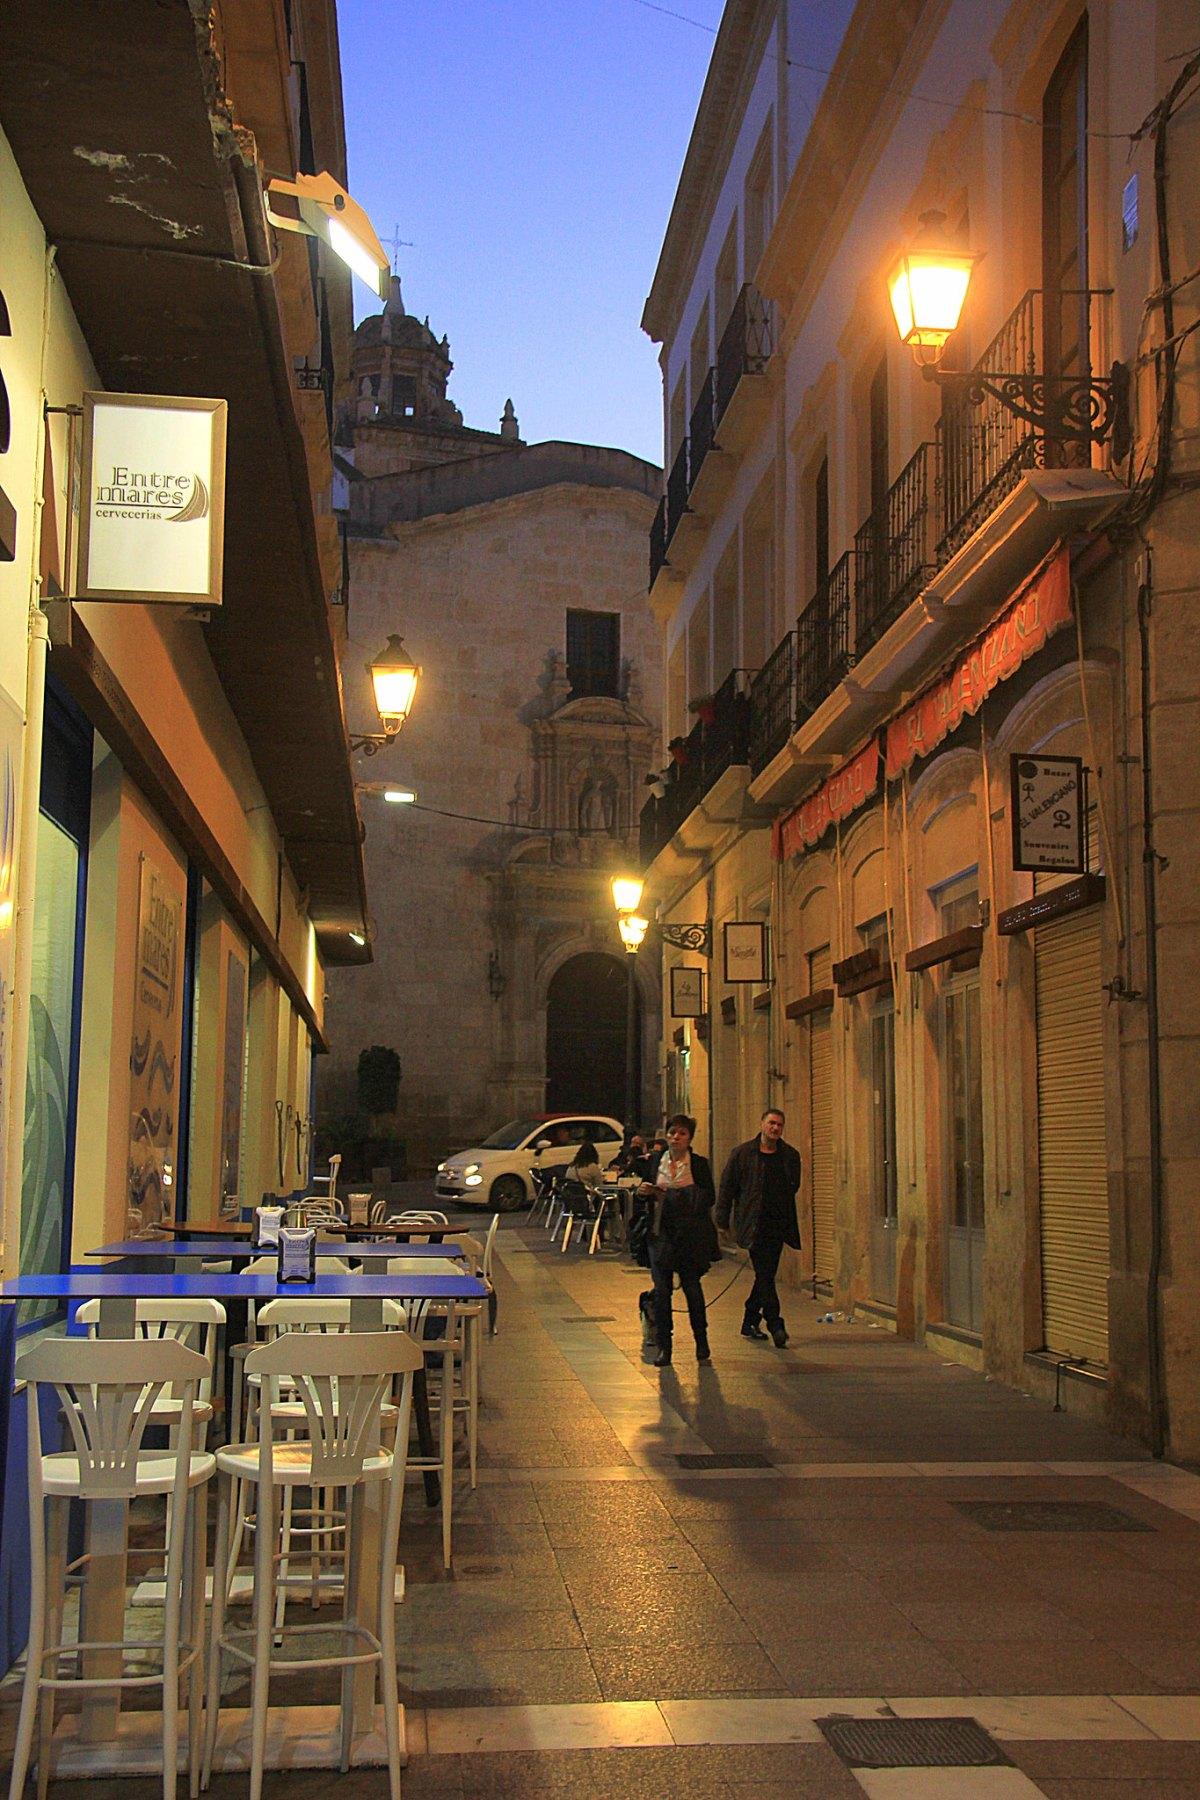 Late evening Almeria city alleys